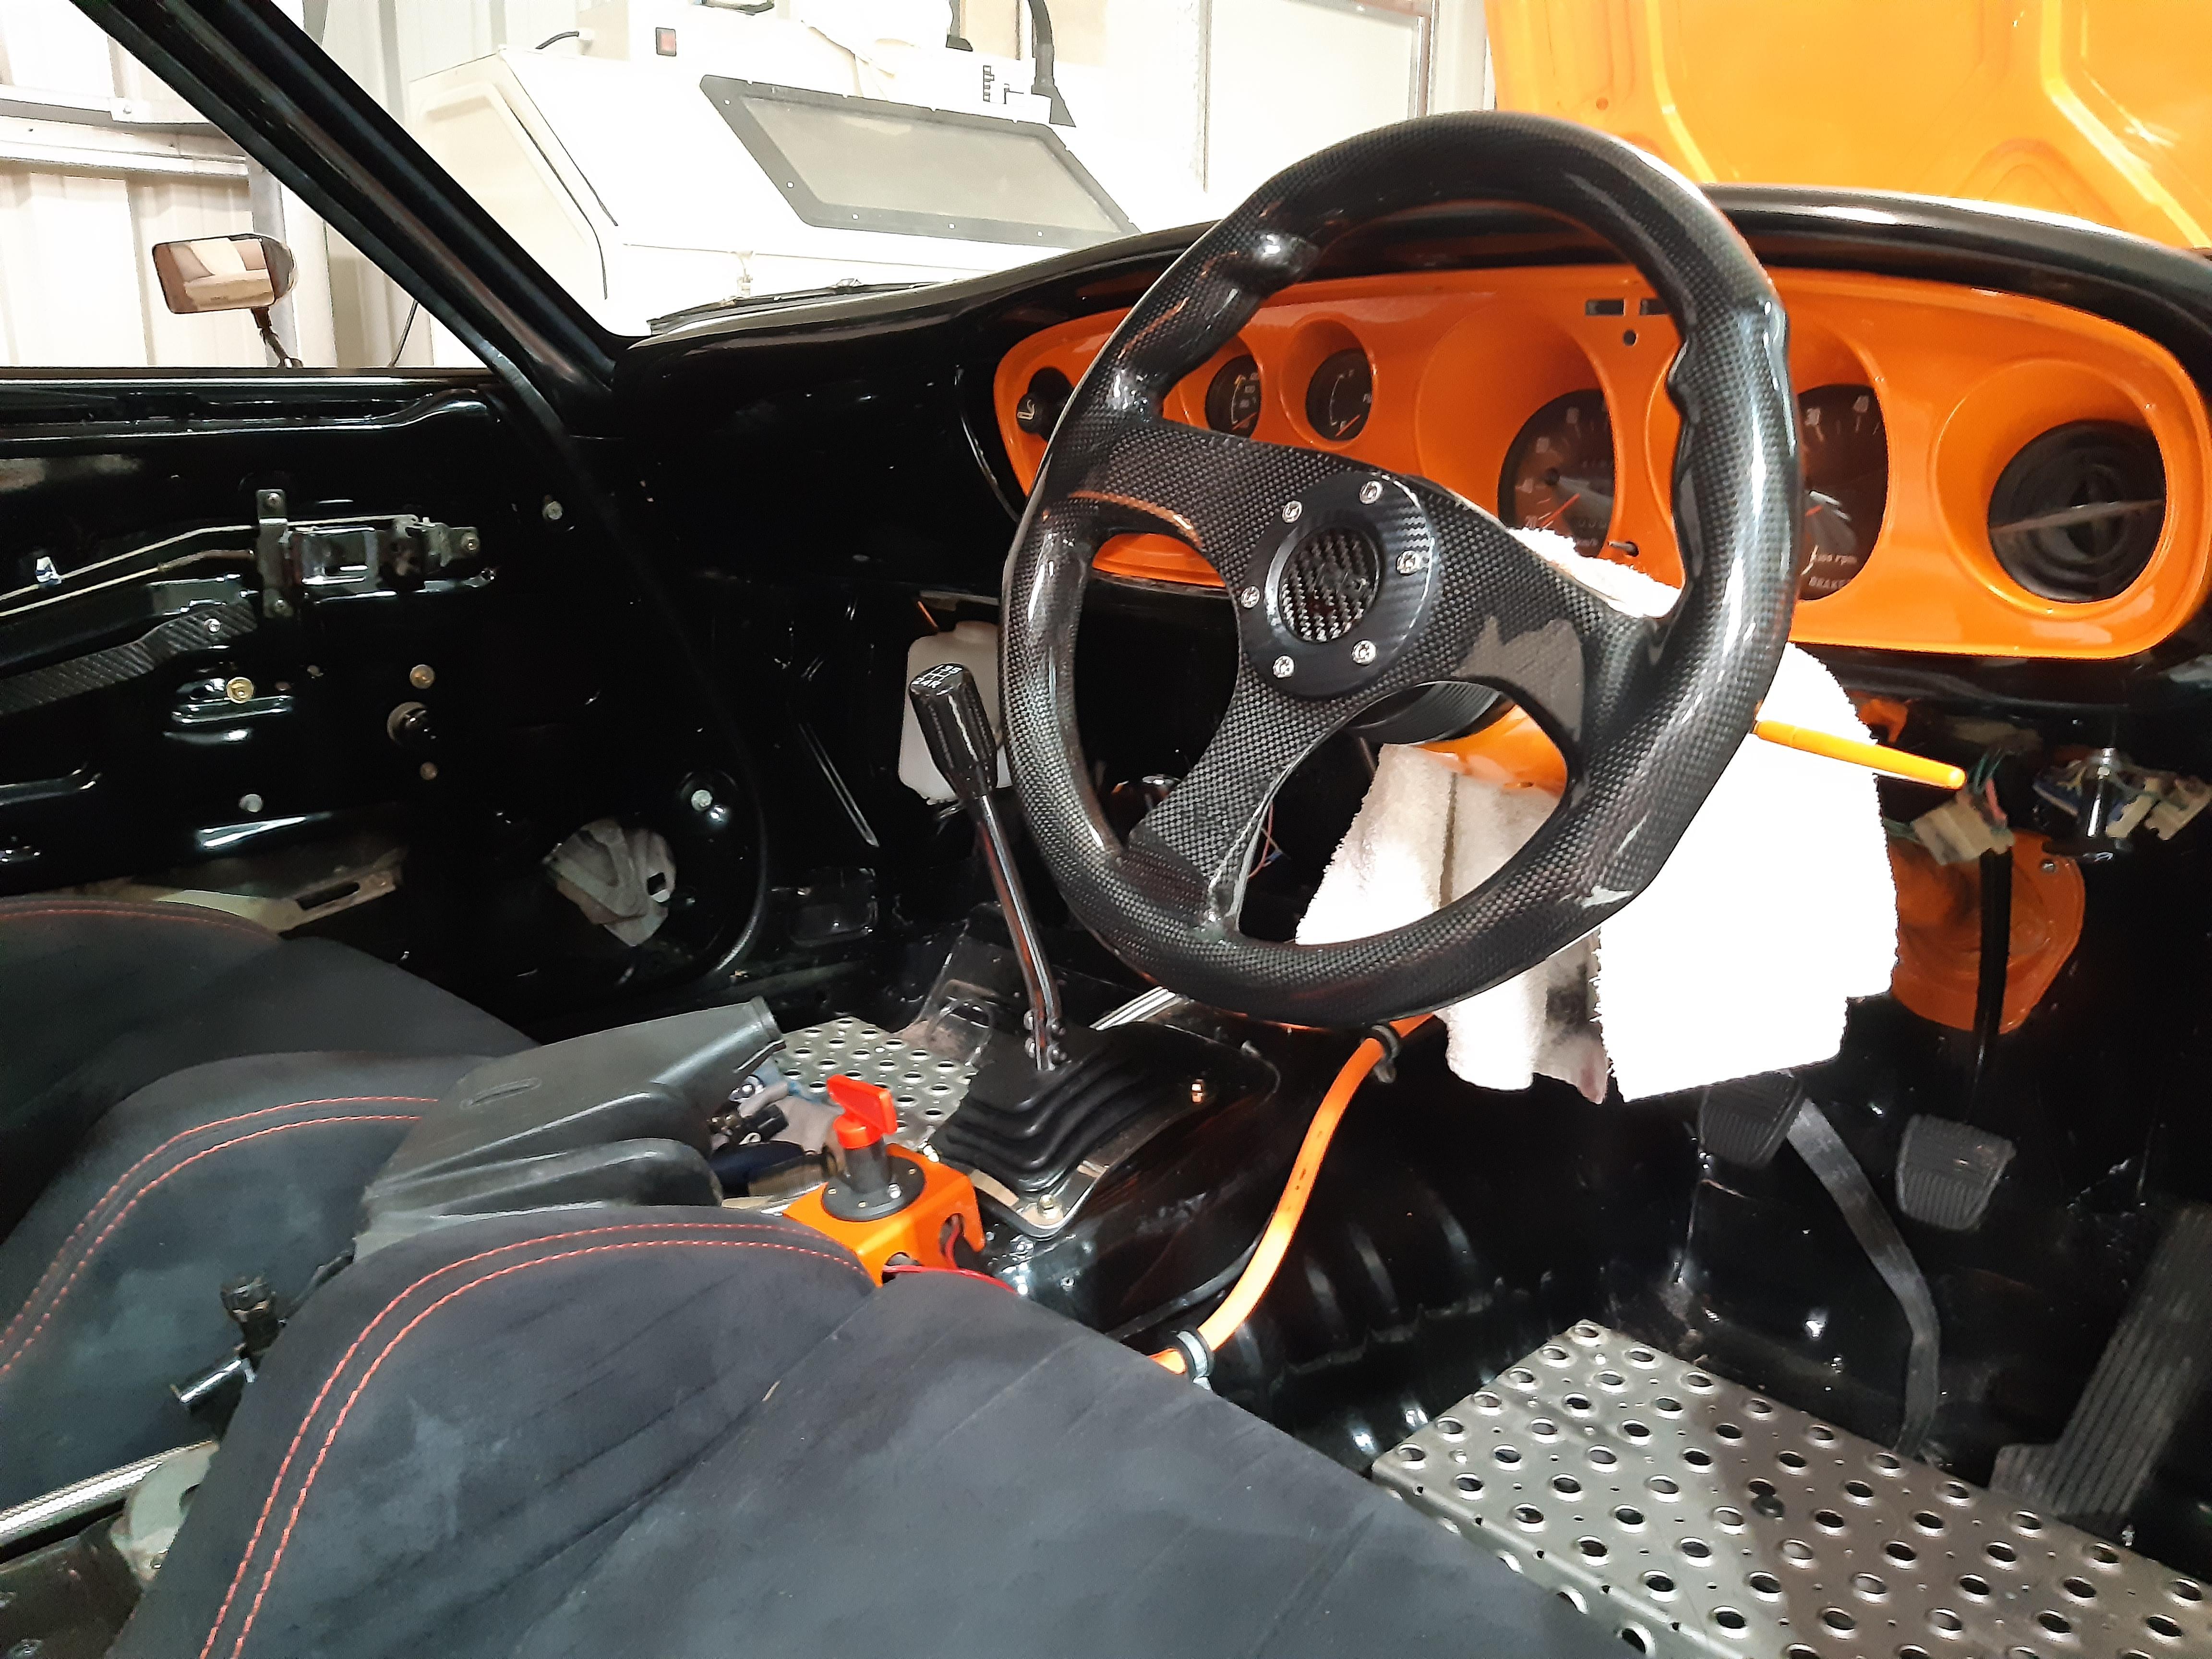 Toyota-Celica-ta2-1